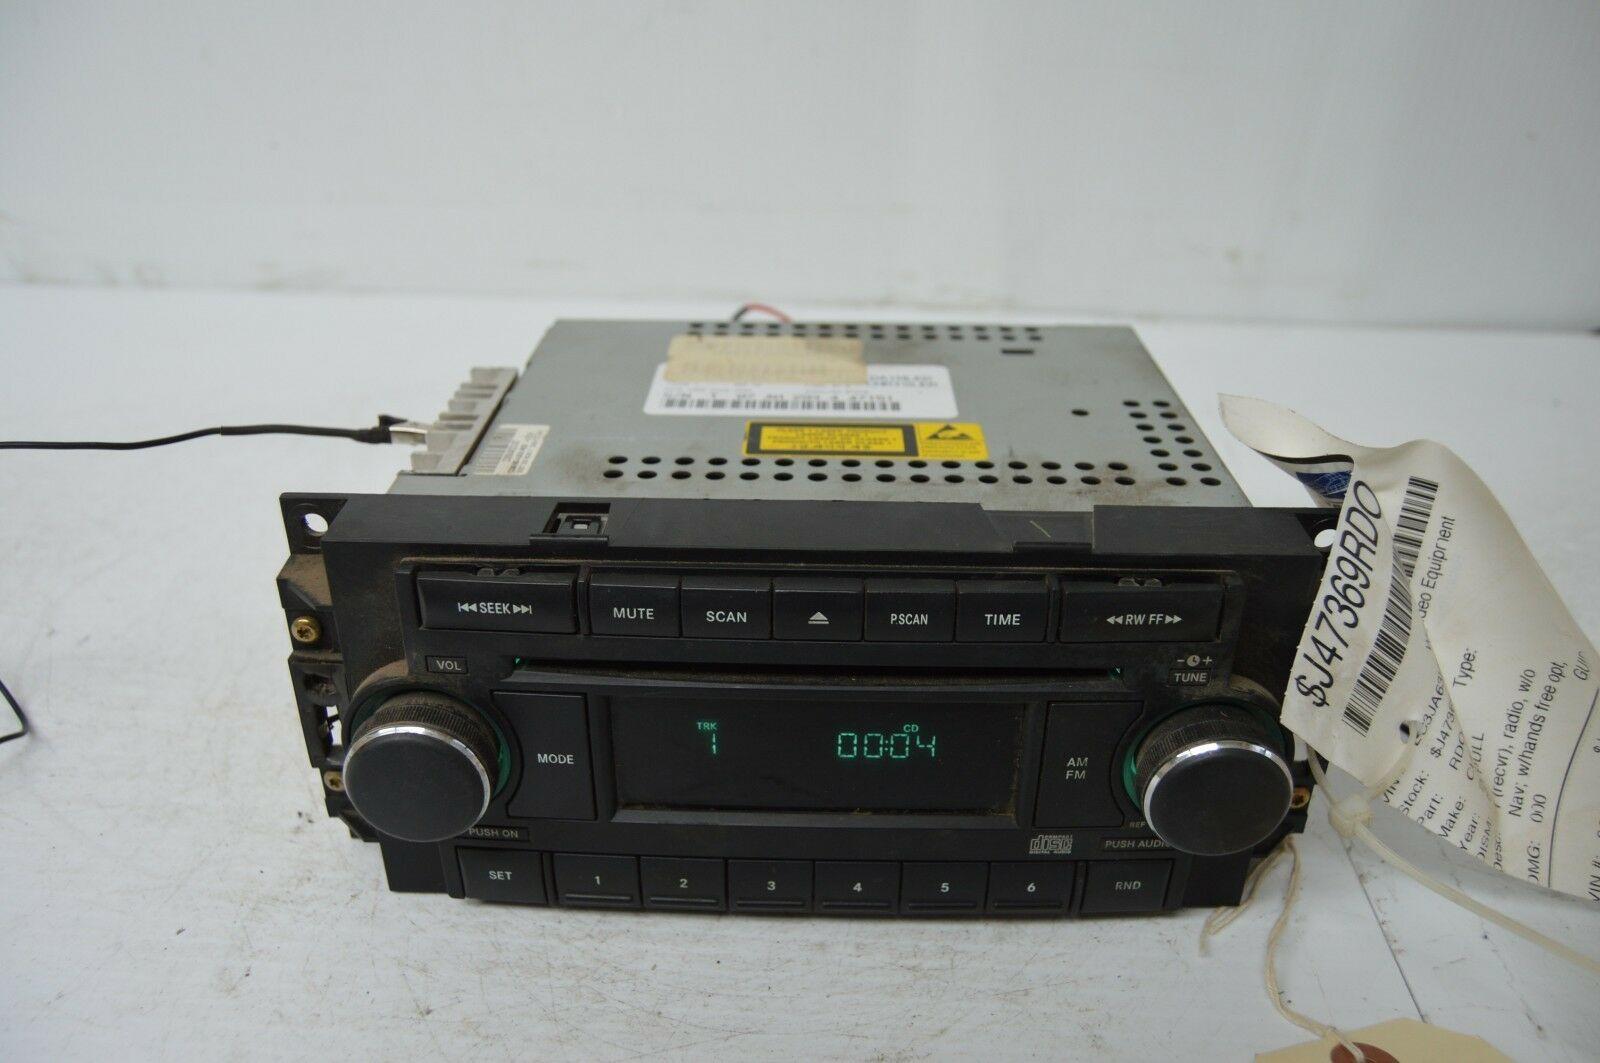 2004-2010 CHRYSLER 300 RADIO CD PLAYER OEM RADIO P05064071AG OEM G53#023 image 2